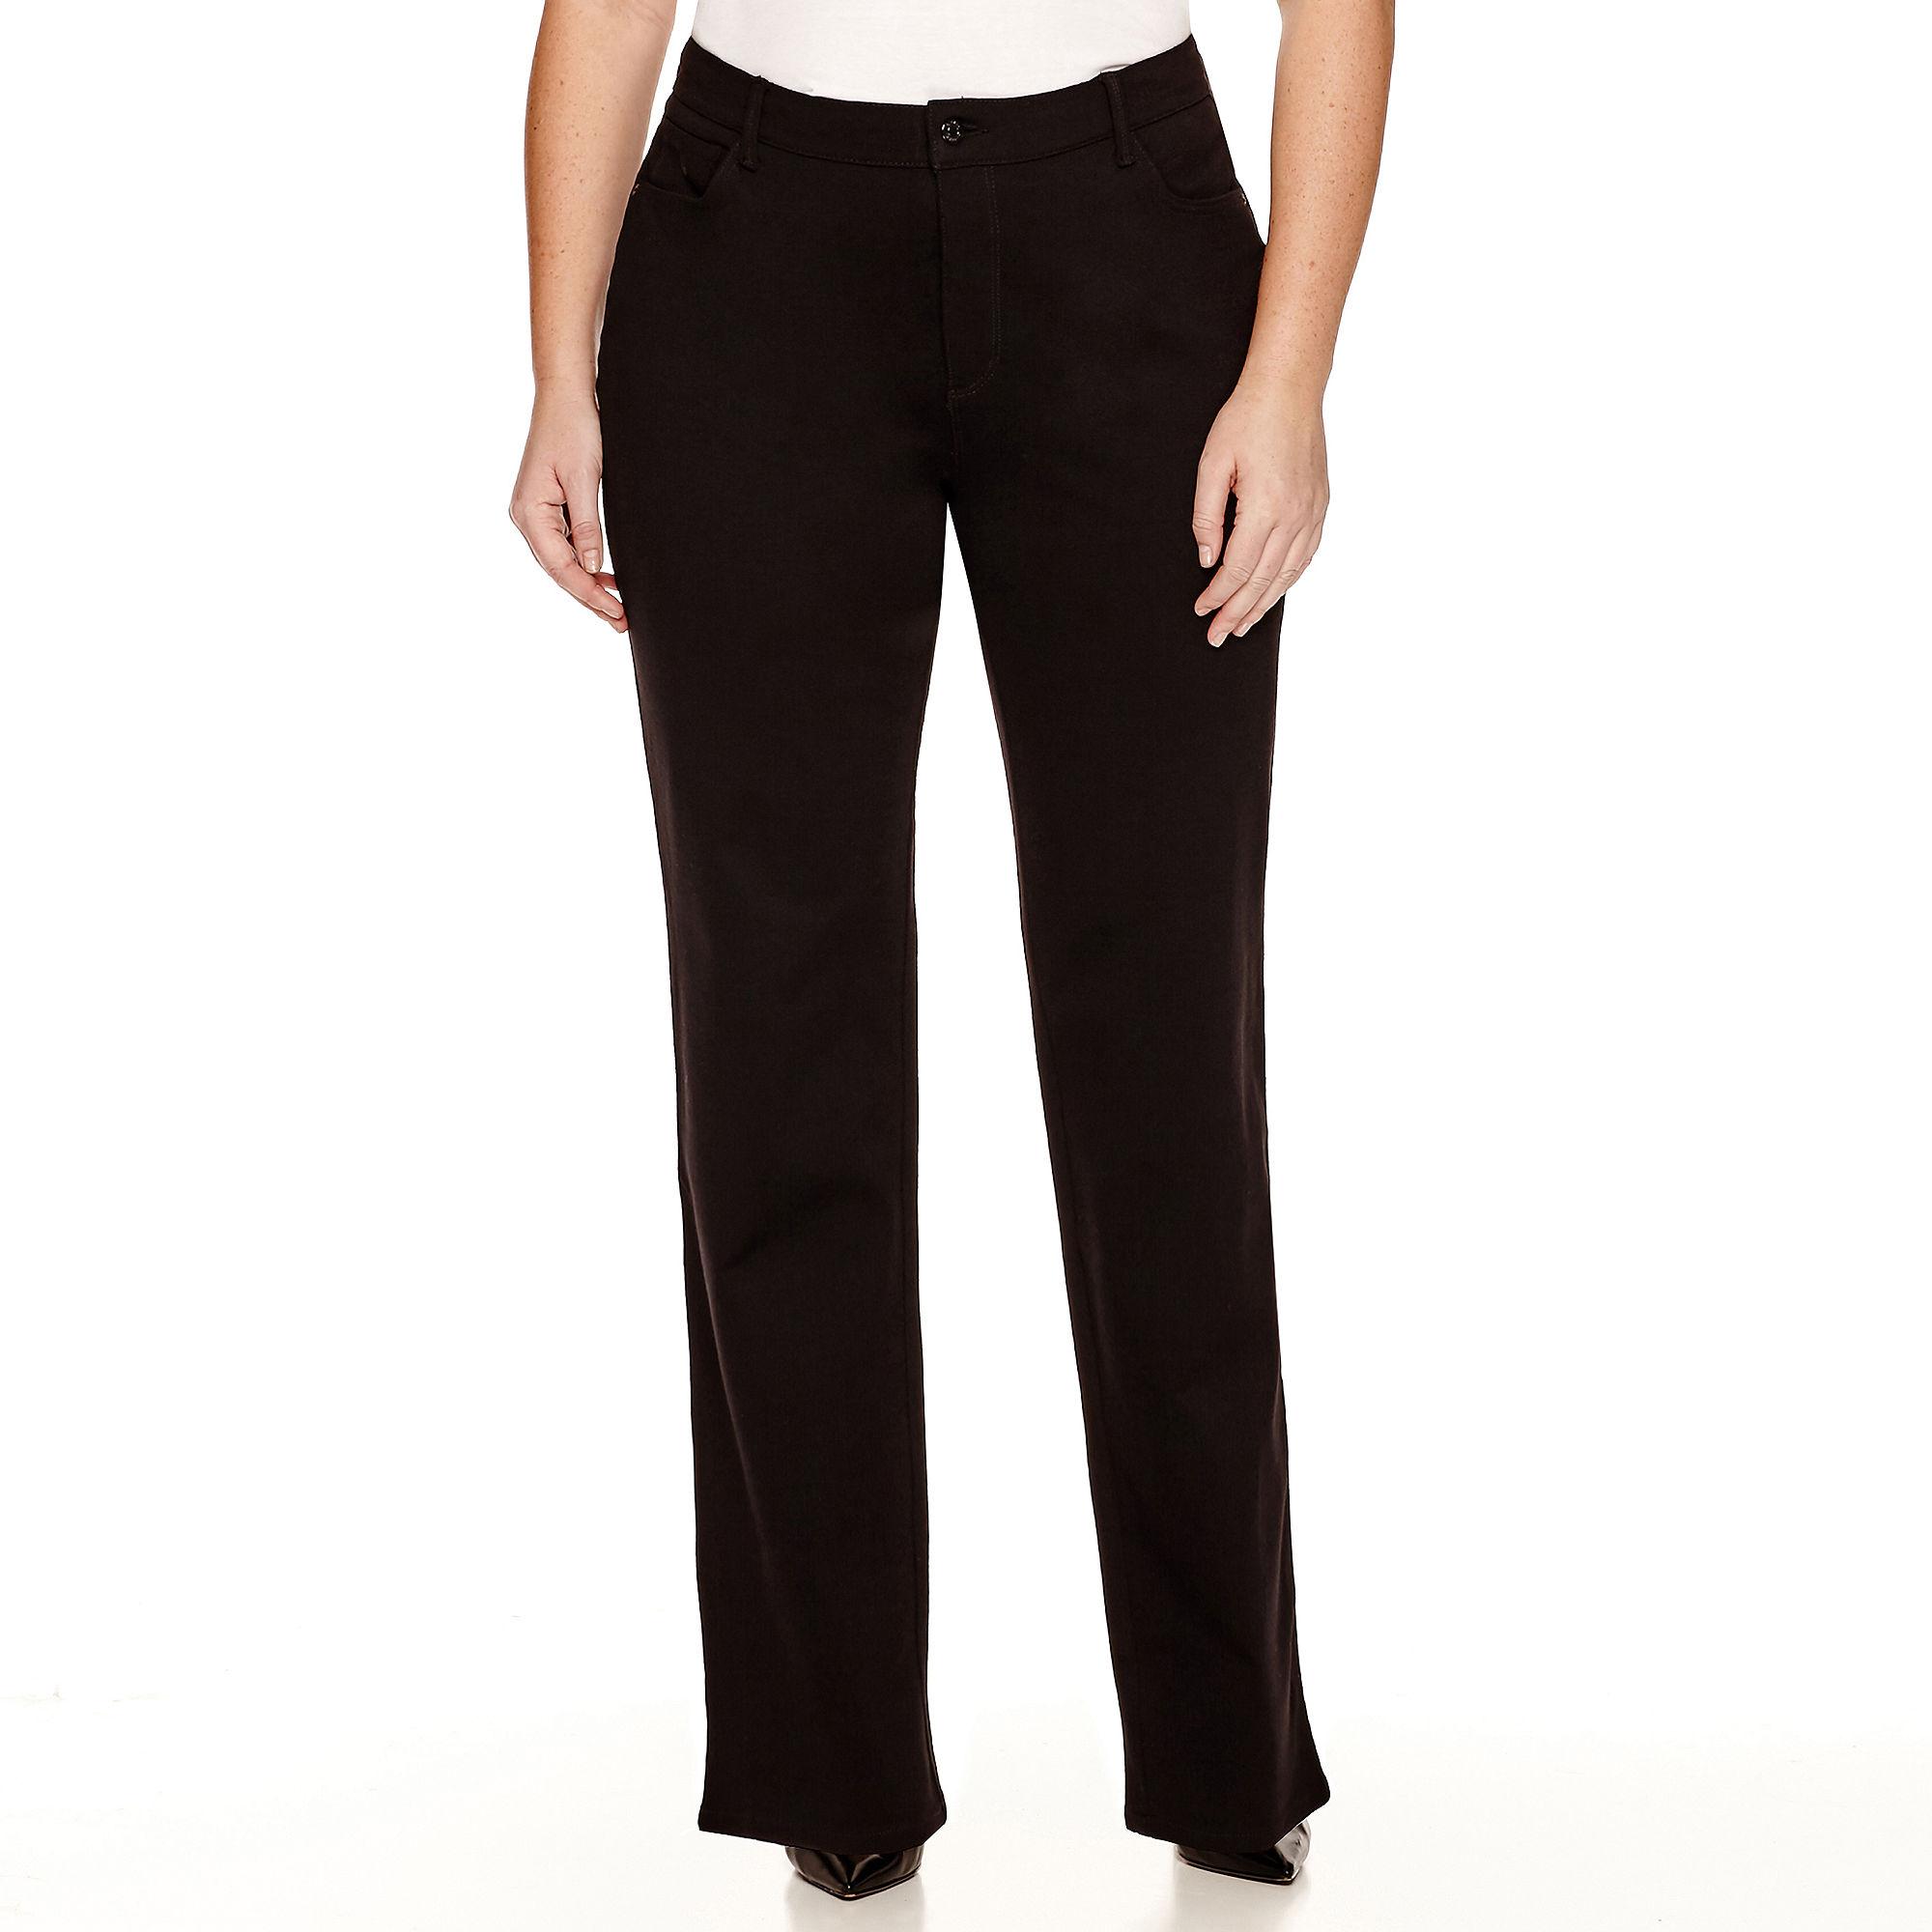 6d3e143475d73 ... UPC 787165739180 product image for Gloria Vanderbilt Amanda Ponte Pants  - Plus